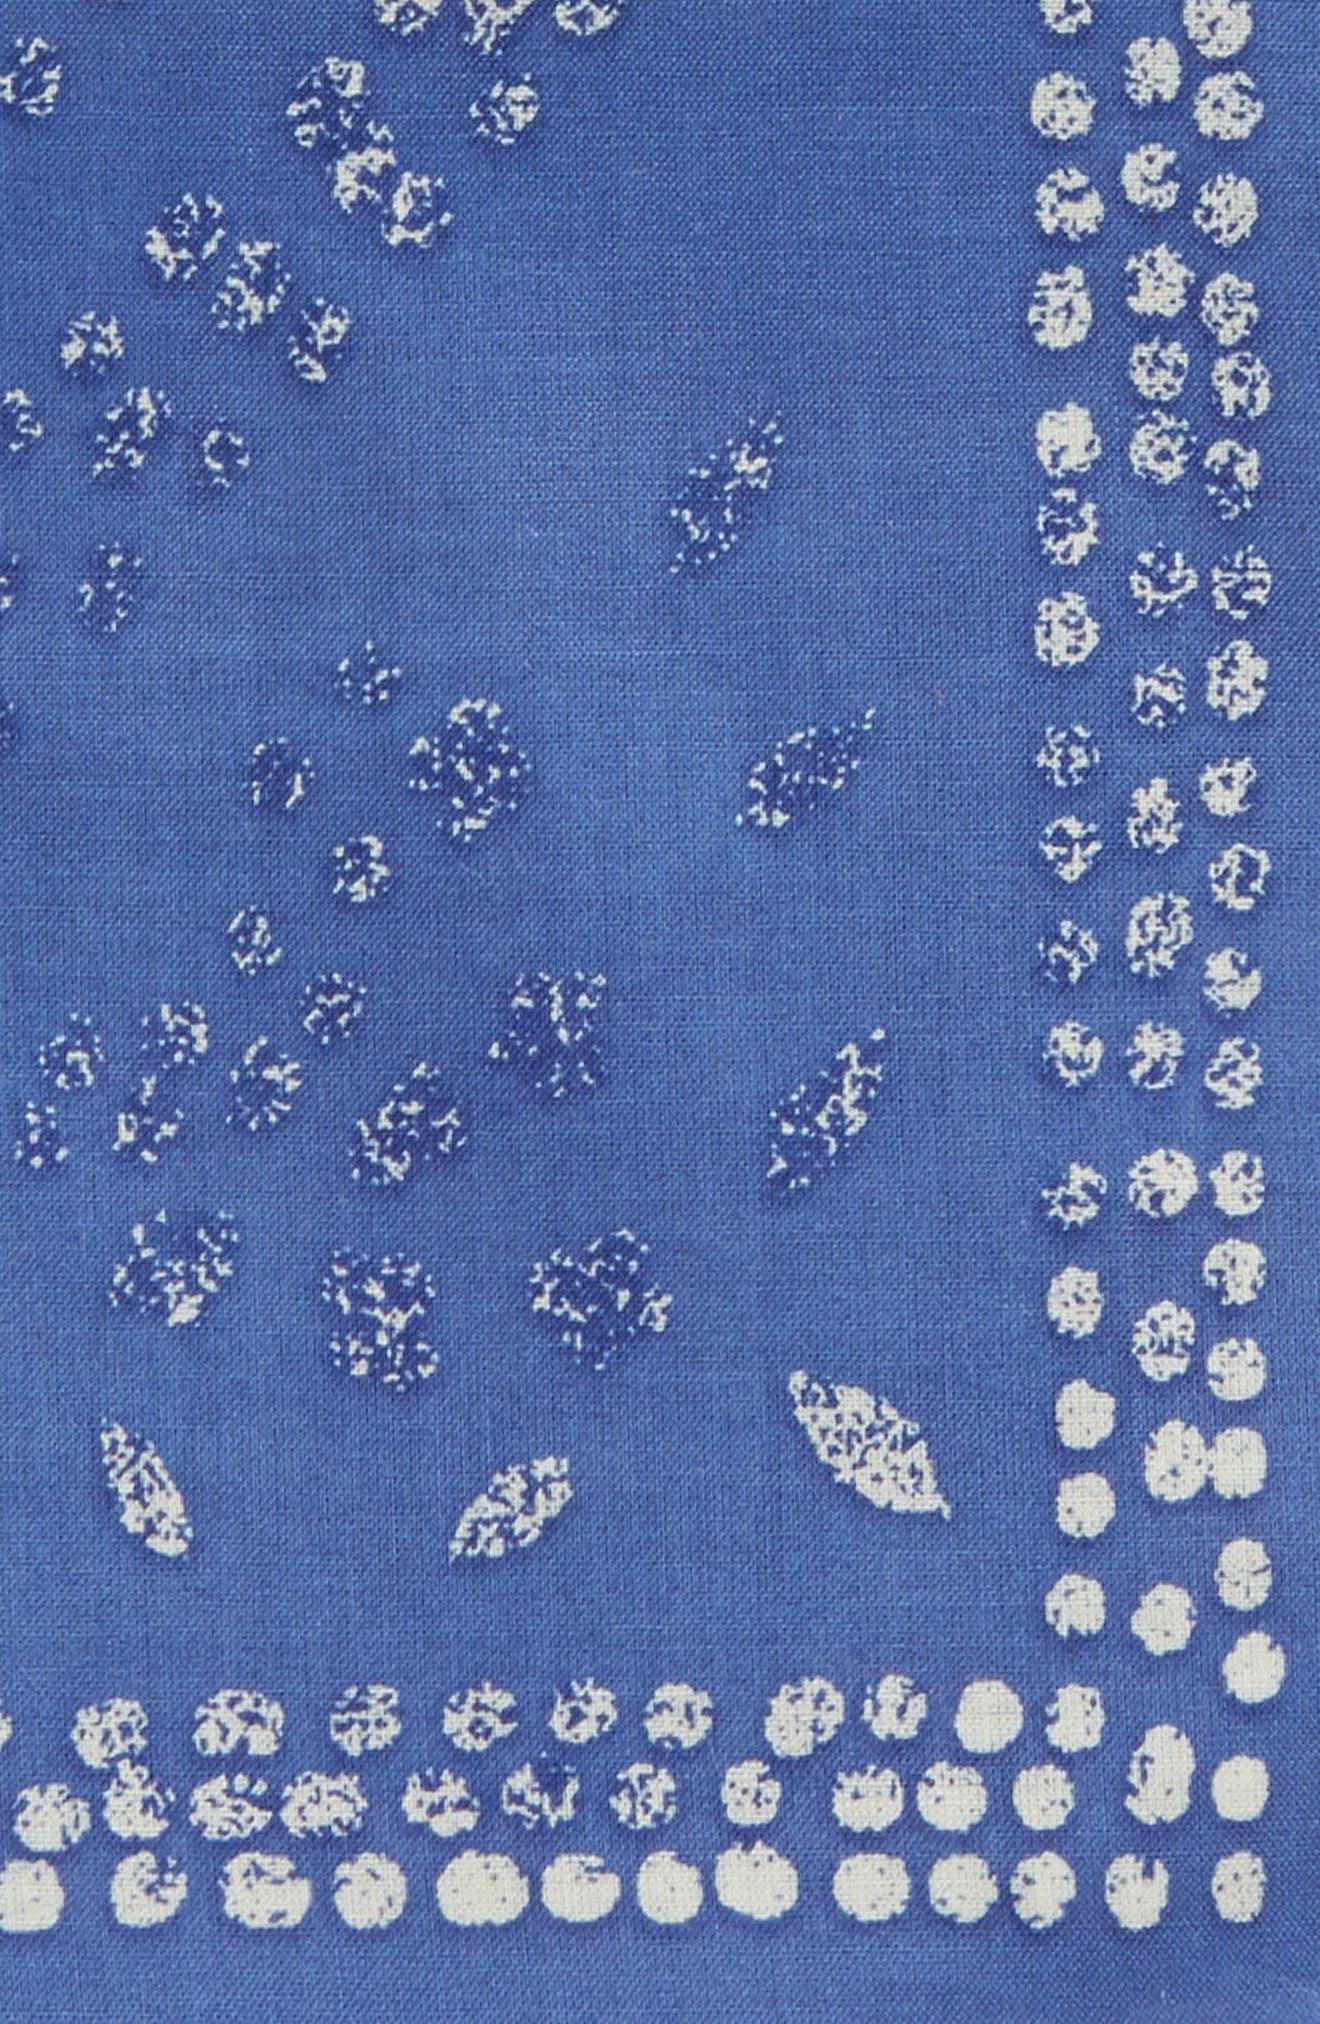 Batik Cotton Pocket Square,                             Alternate thumbnail 3, color,                             Ocean